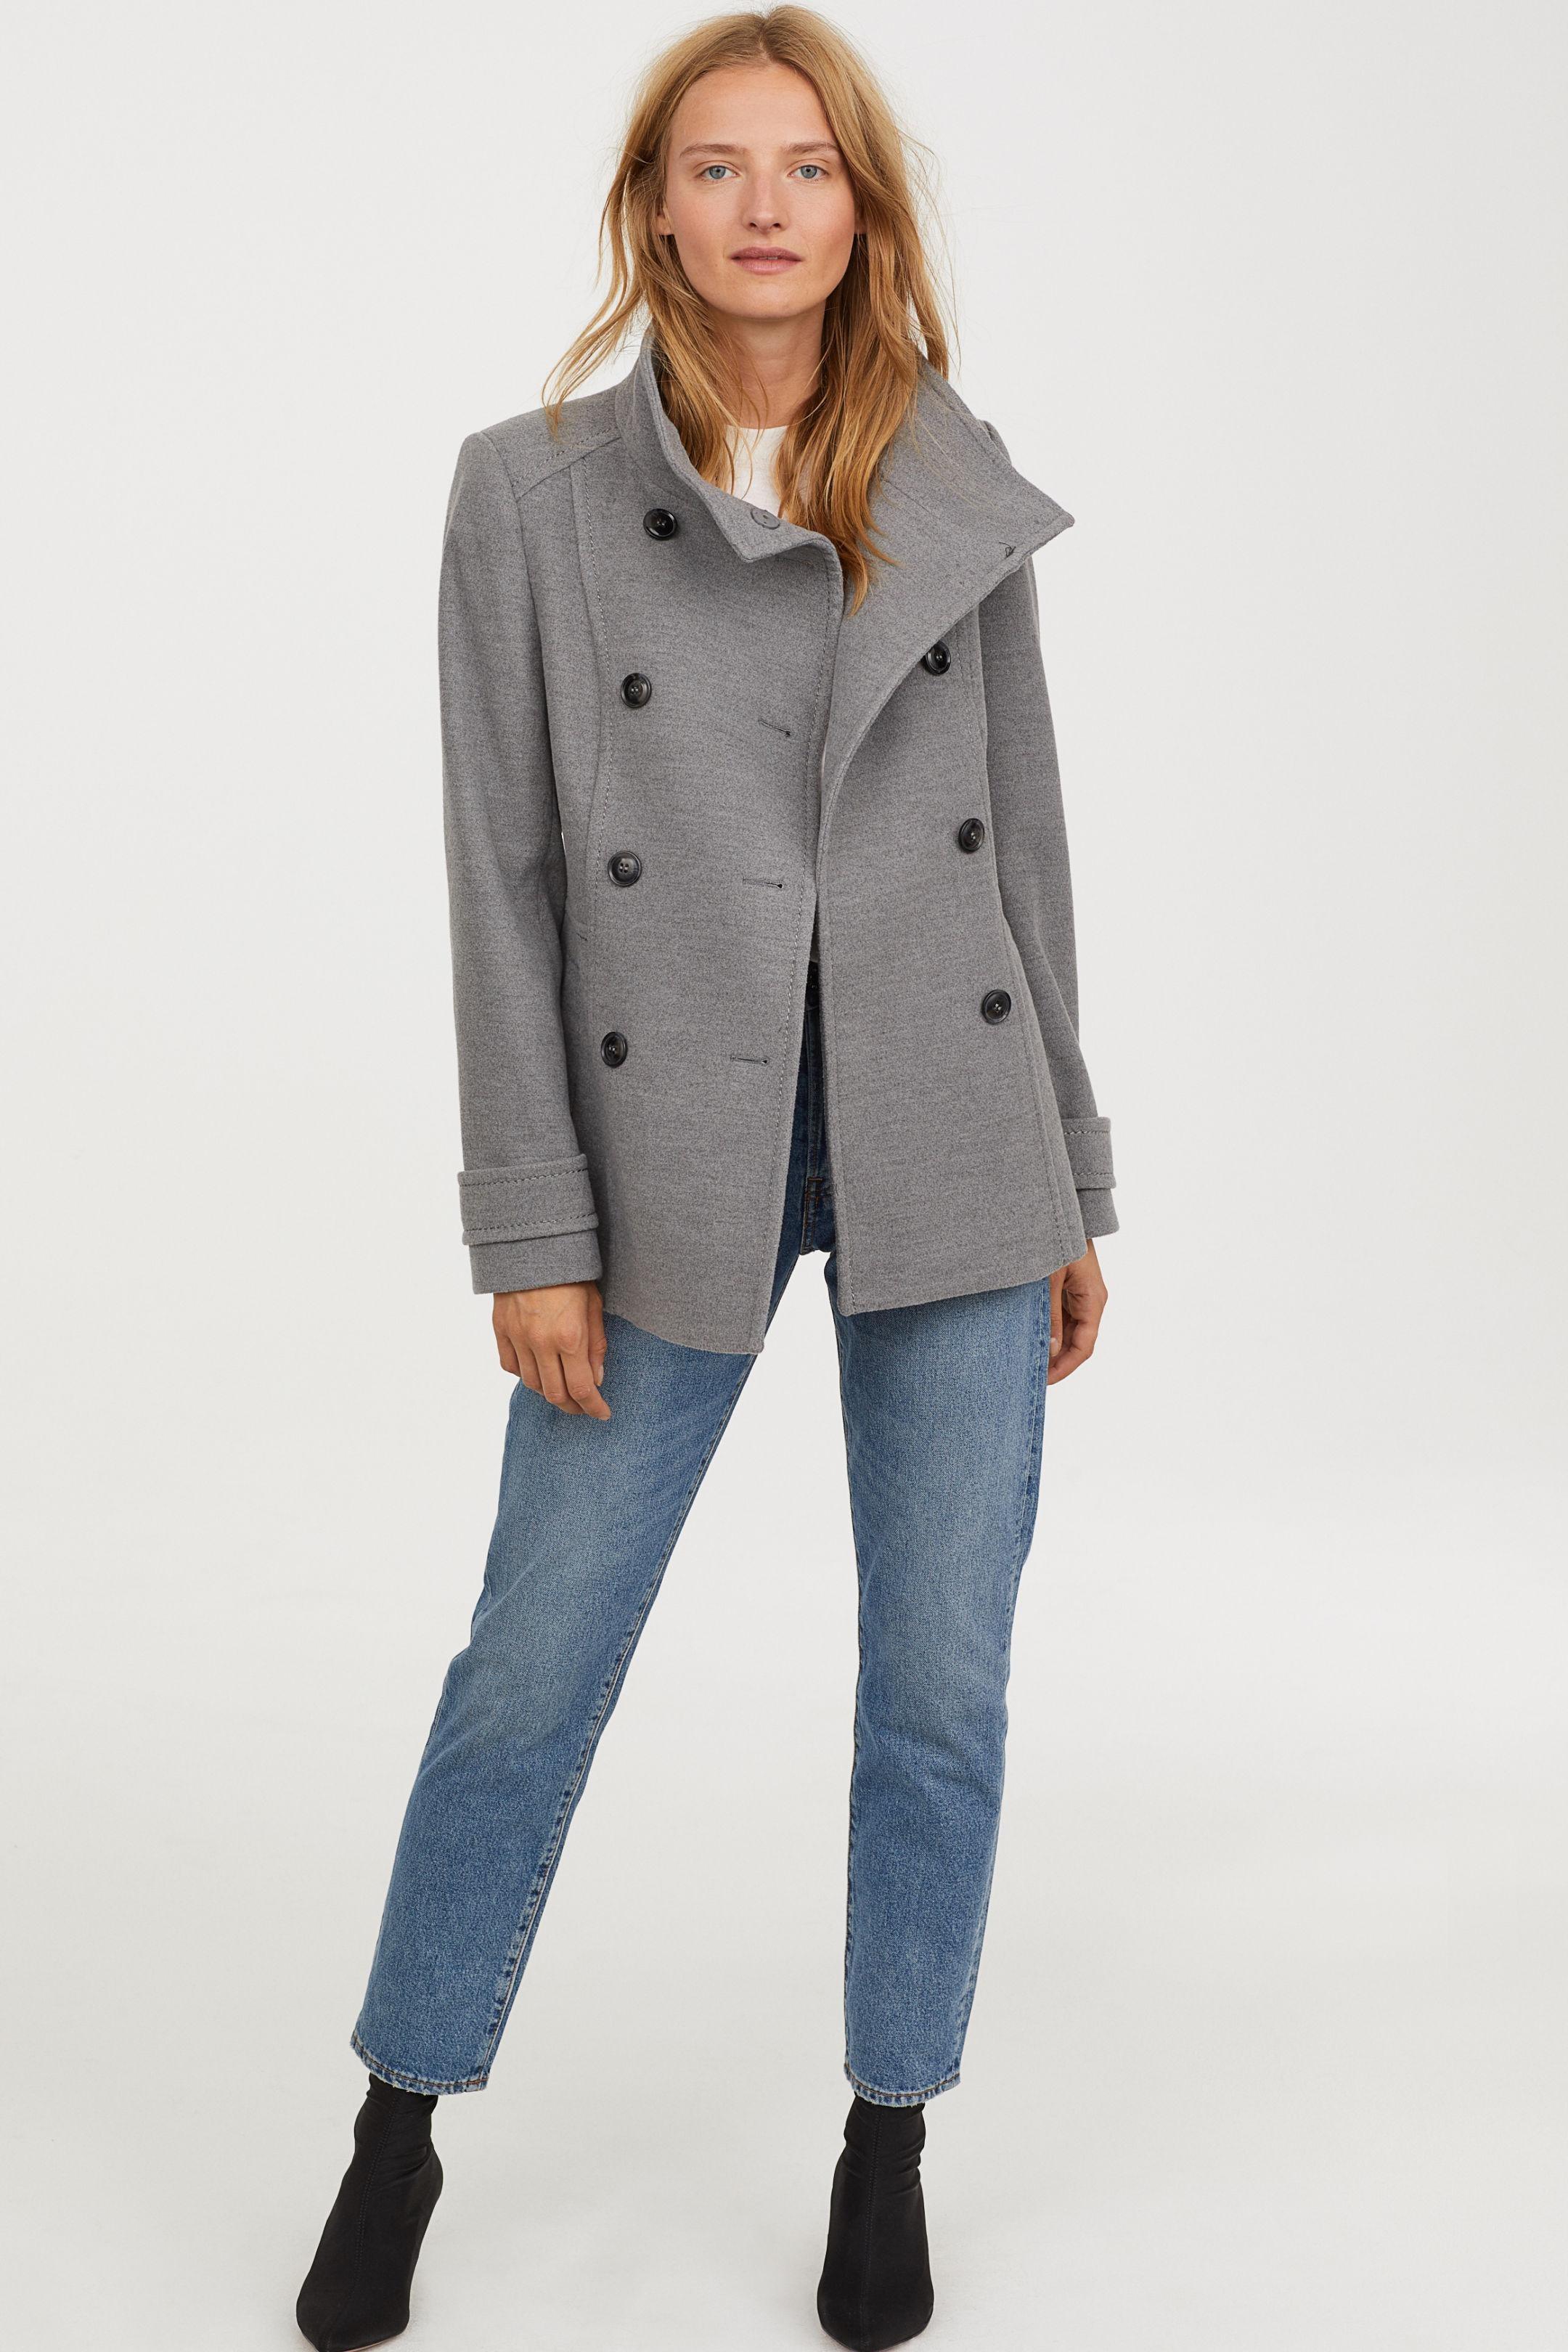 Пальто H&M Демисезон (3352) photo